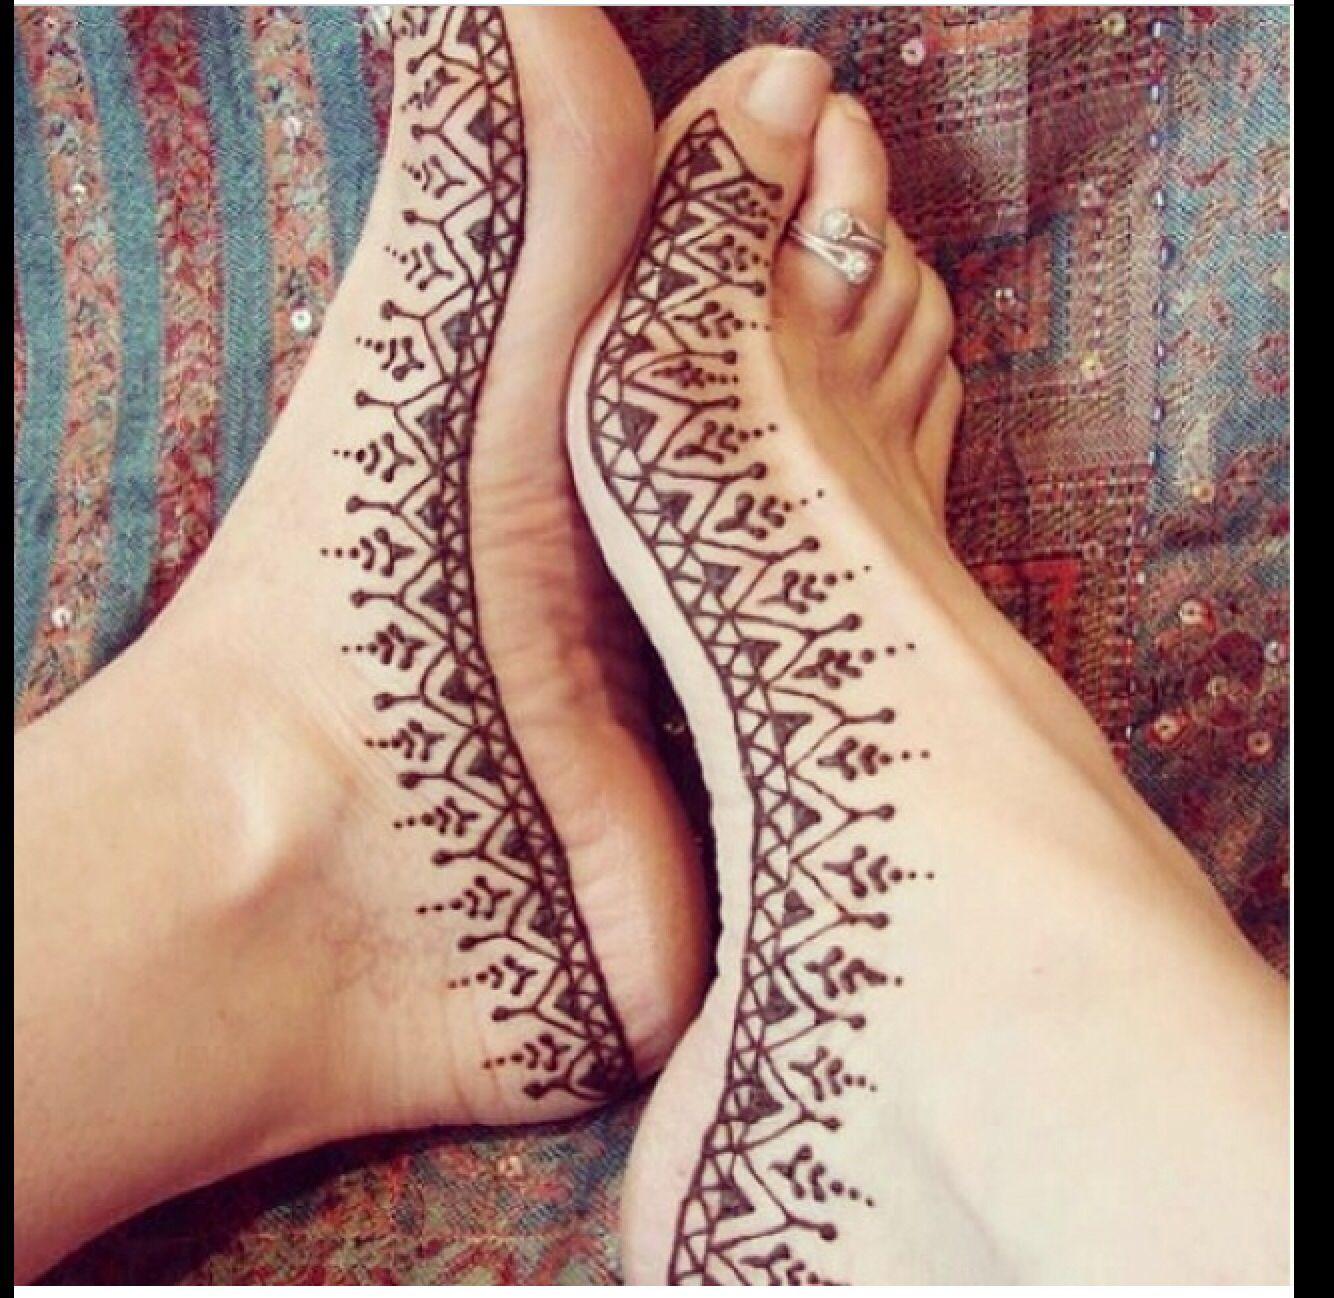 Origins henna body art henna tattoo designs foot henna